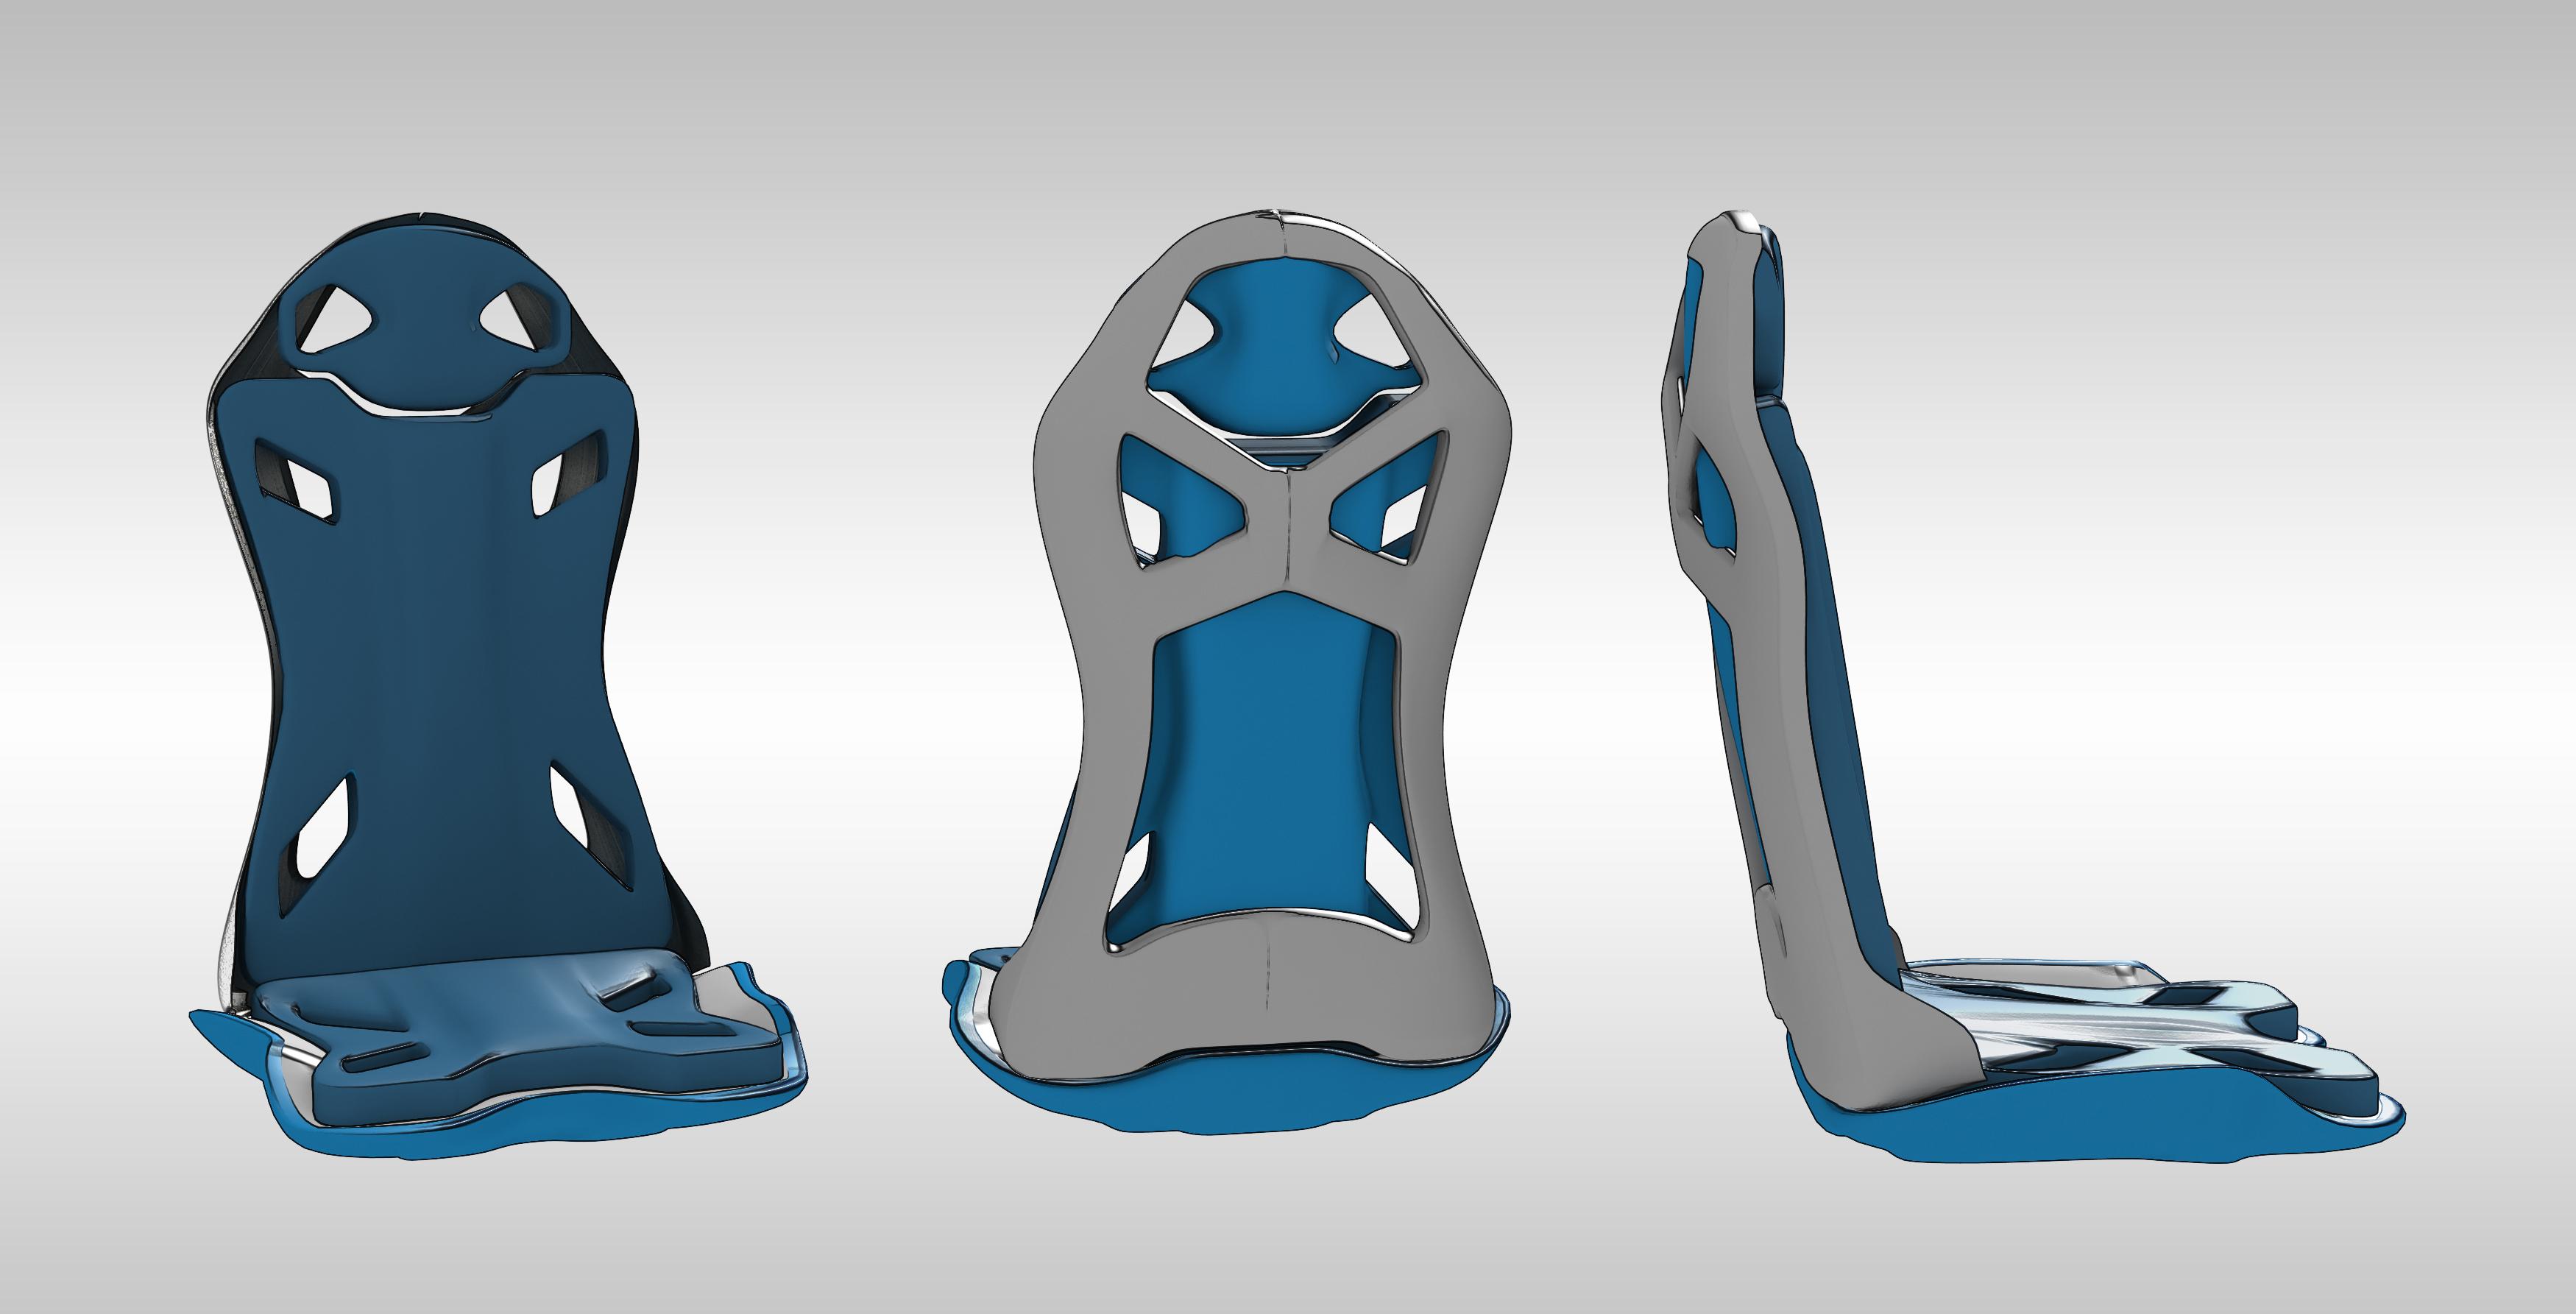 X-Jet_Seat Design_02